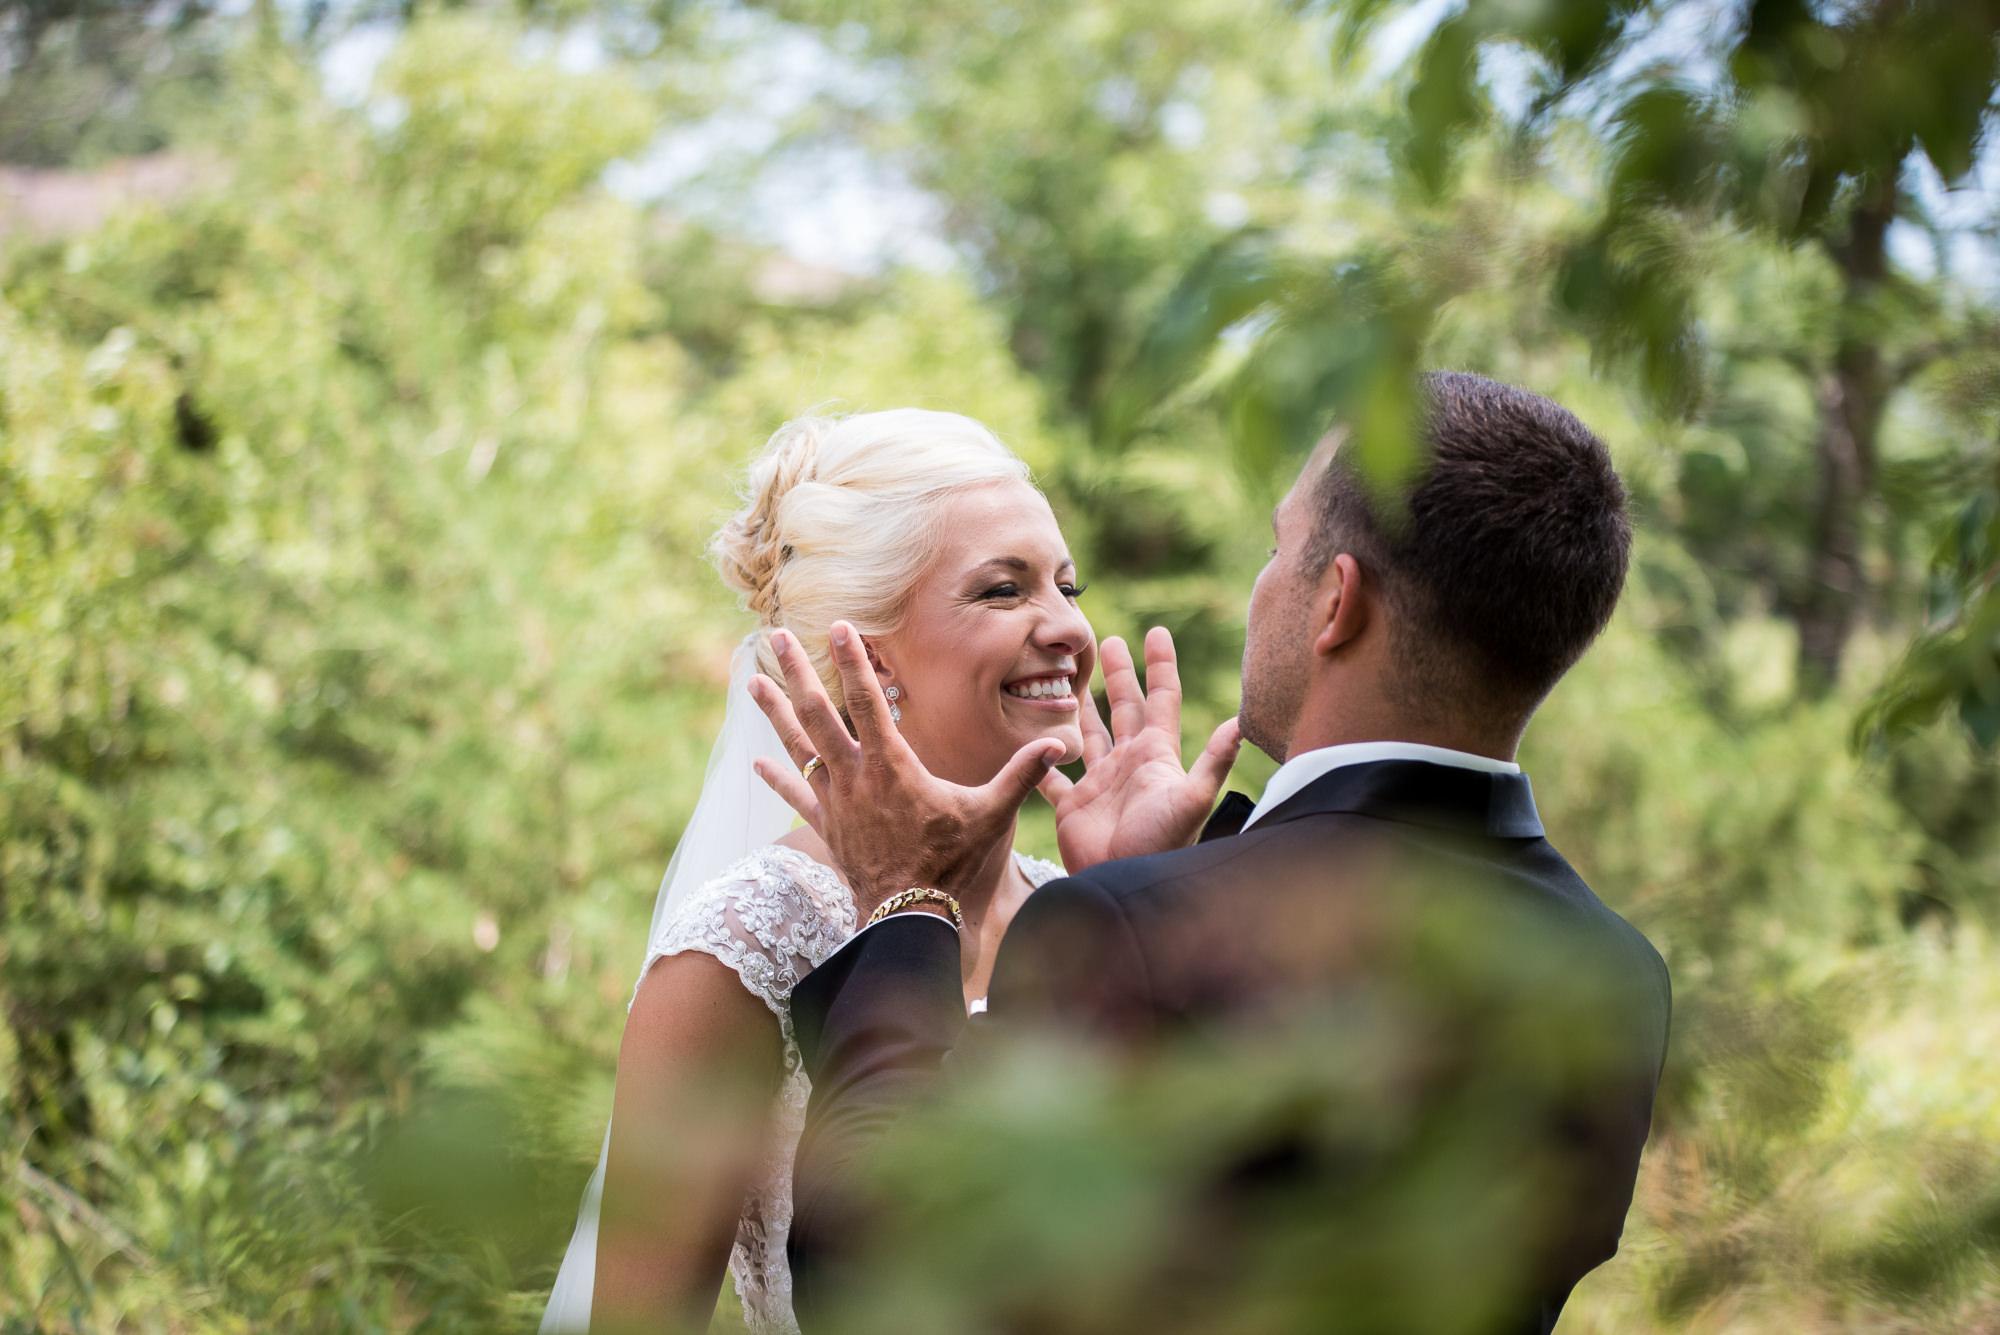 DAKOTA-DUNES-WEDDING-SOUTH-DAKOTA-WEDDING-PHOTOGRAPHER-0007.jpg